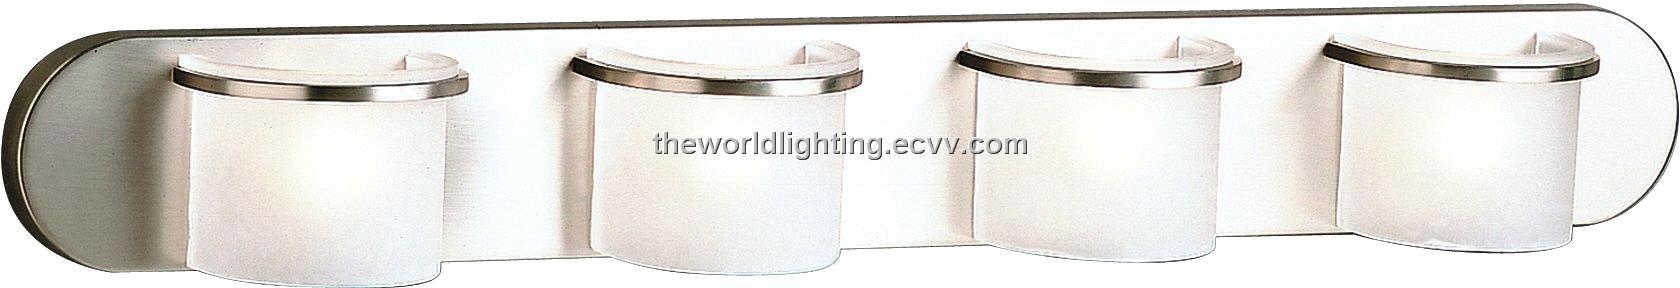 Bl6012 Chrome Metal Stand Glass Cover Modern Bathroom Vanity Light With 3 Bulbs China Purchasing Souring Agent Ecvv Com Service Platform